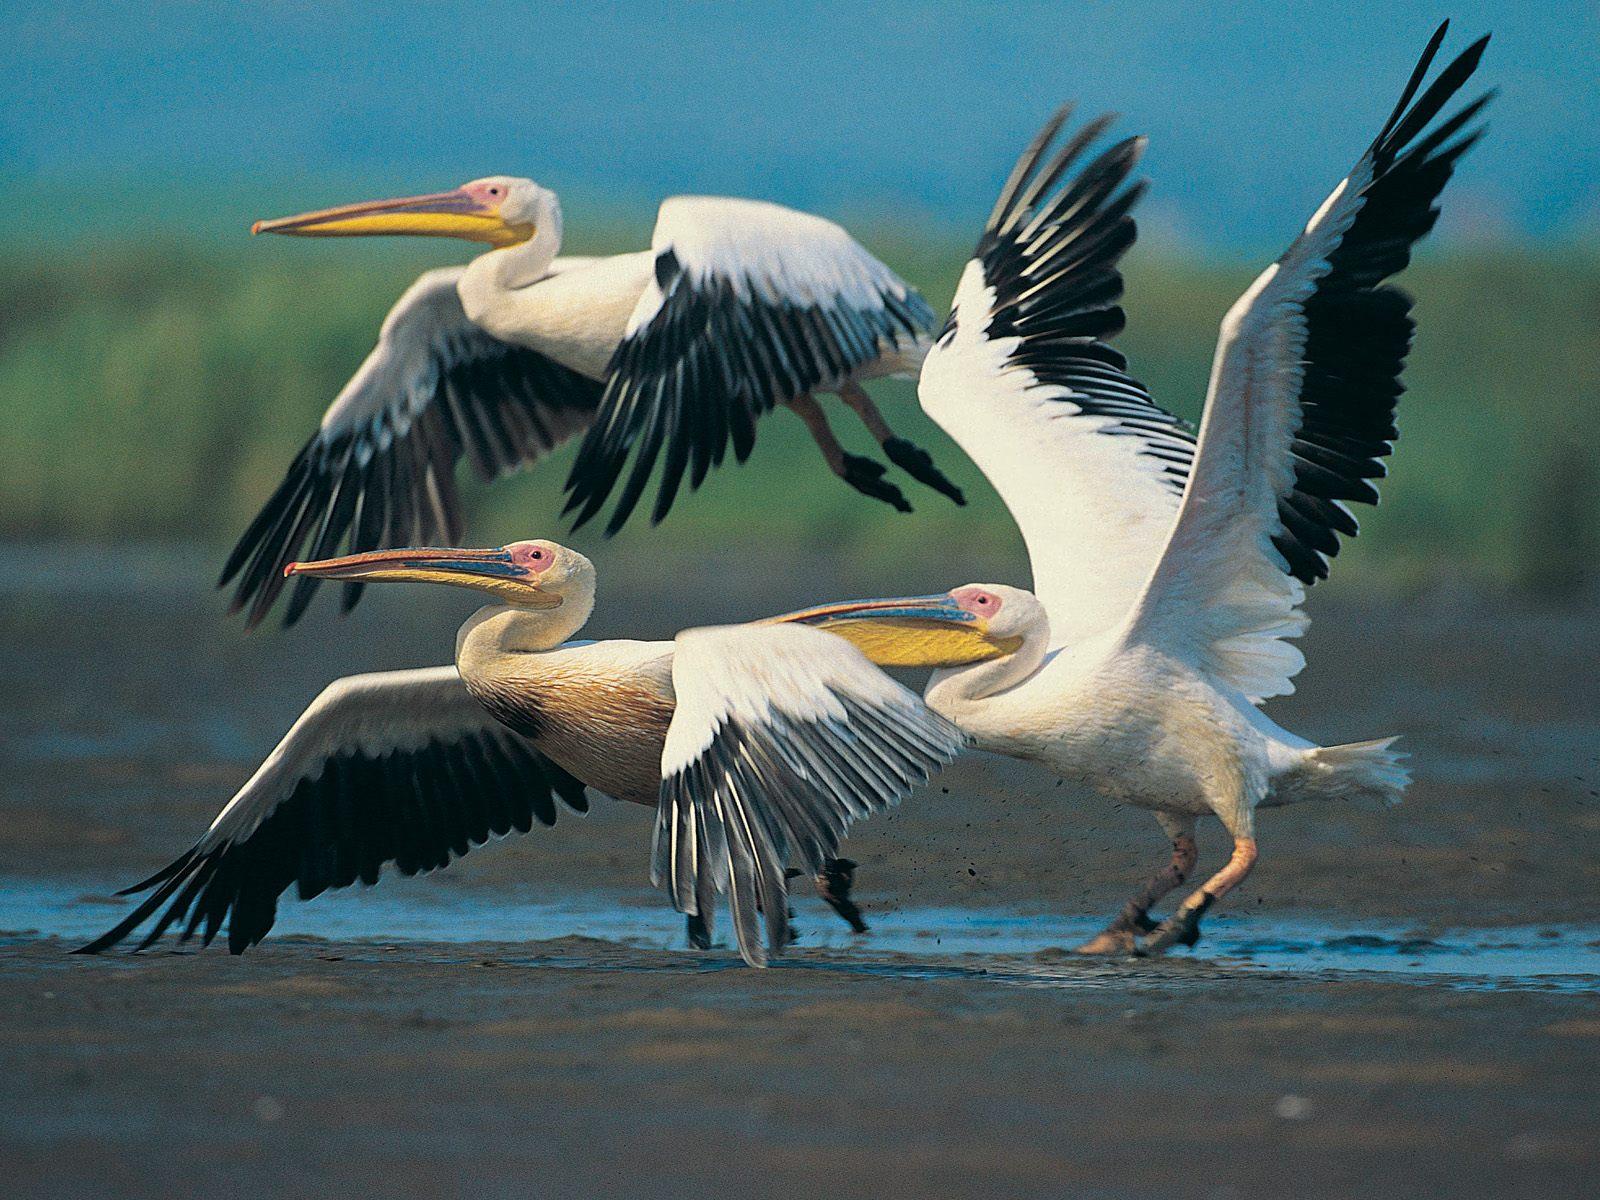 Japan Beautiful Birds Desktop Wallpapers for 1600x1200